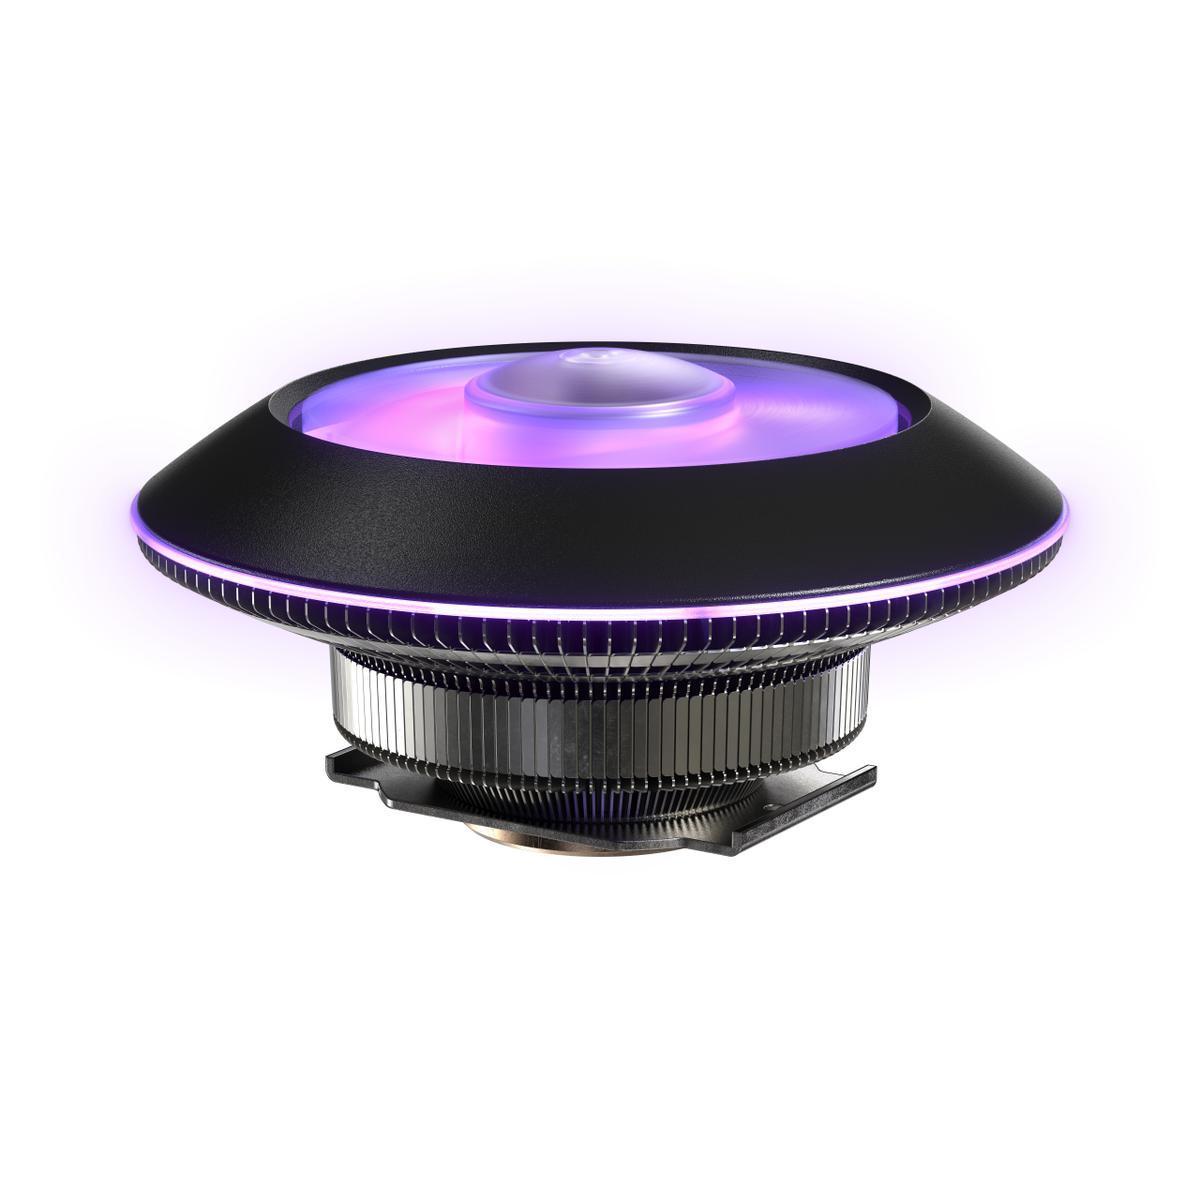 Охладител за процесор Cooler Master MasterAir G100M RGB, AMD/INTEL